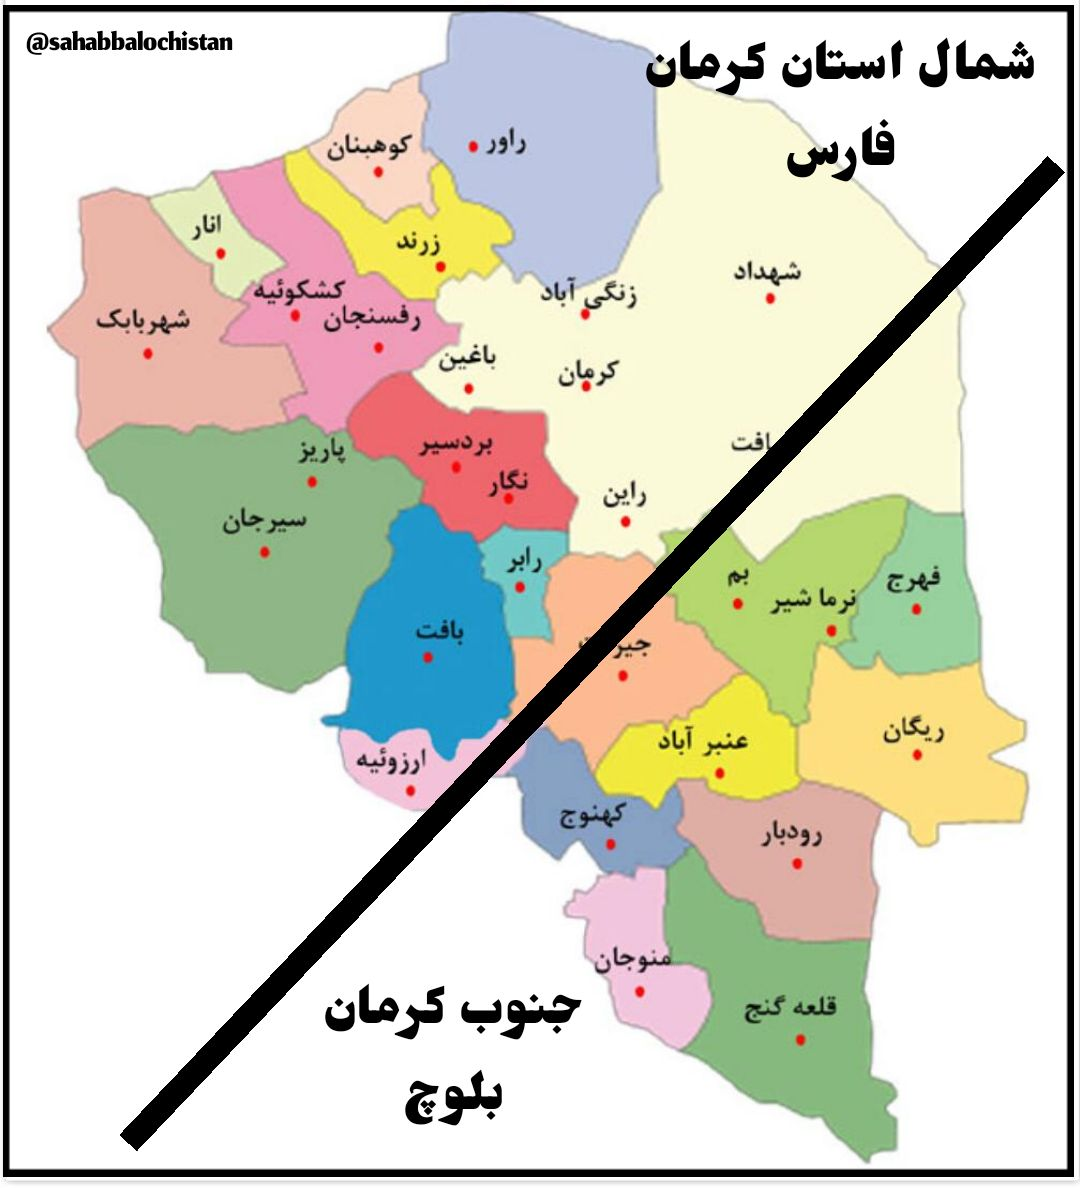 شعب ابی طالب، تحریم اقتصادی بلوچ (نمونه کرمان)  حبیب الله سربازی بلوچ